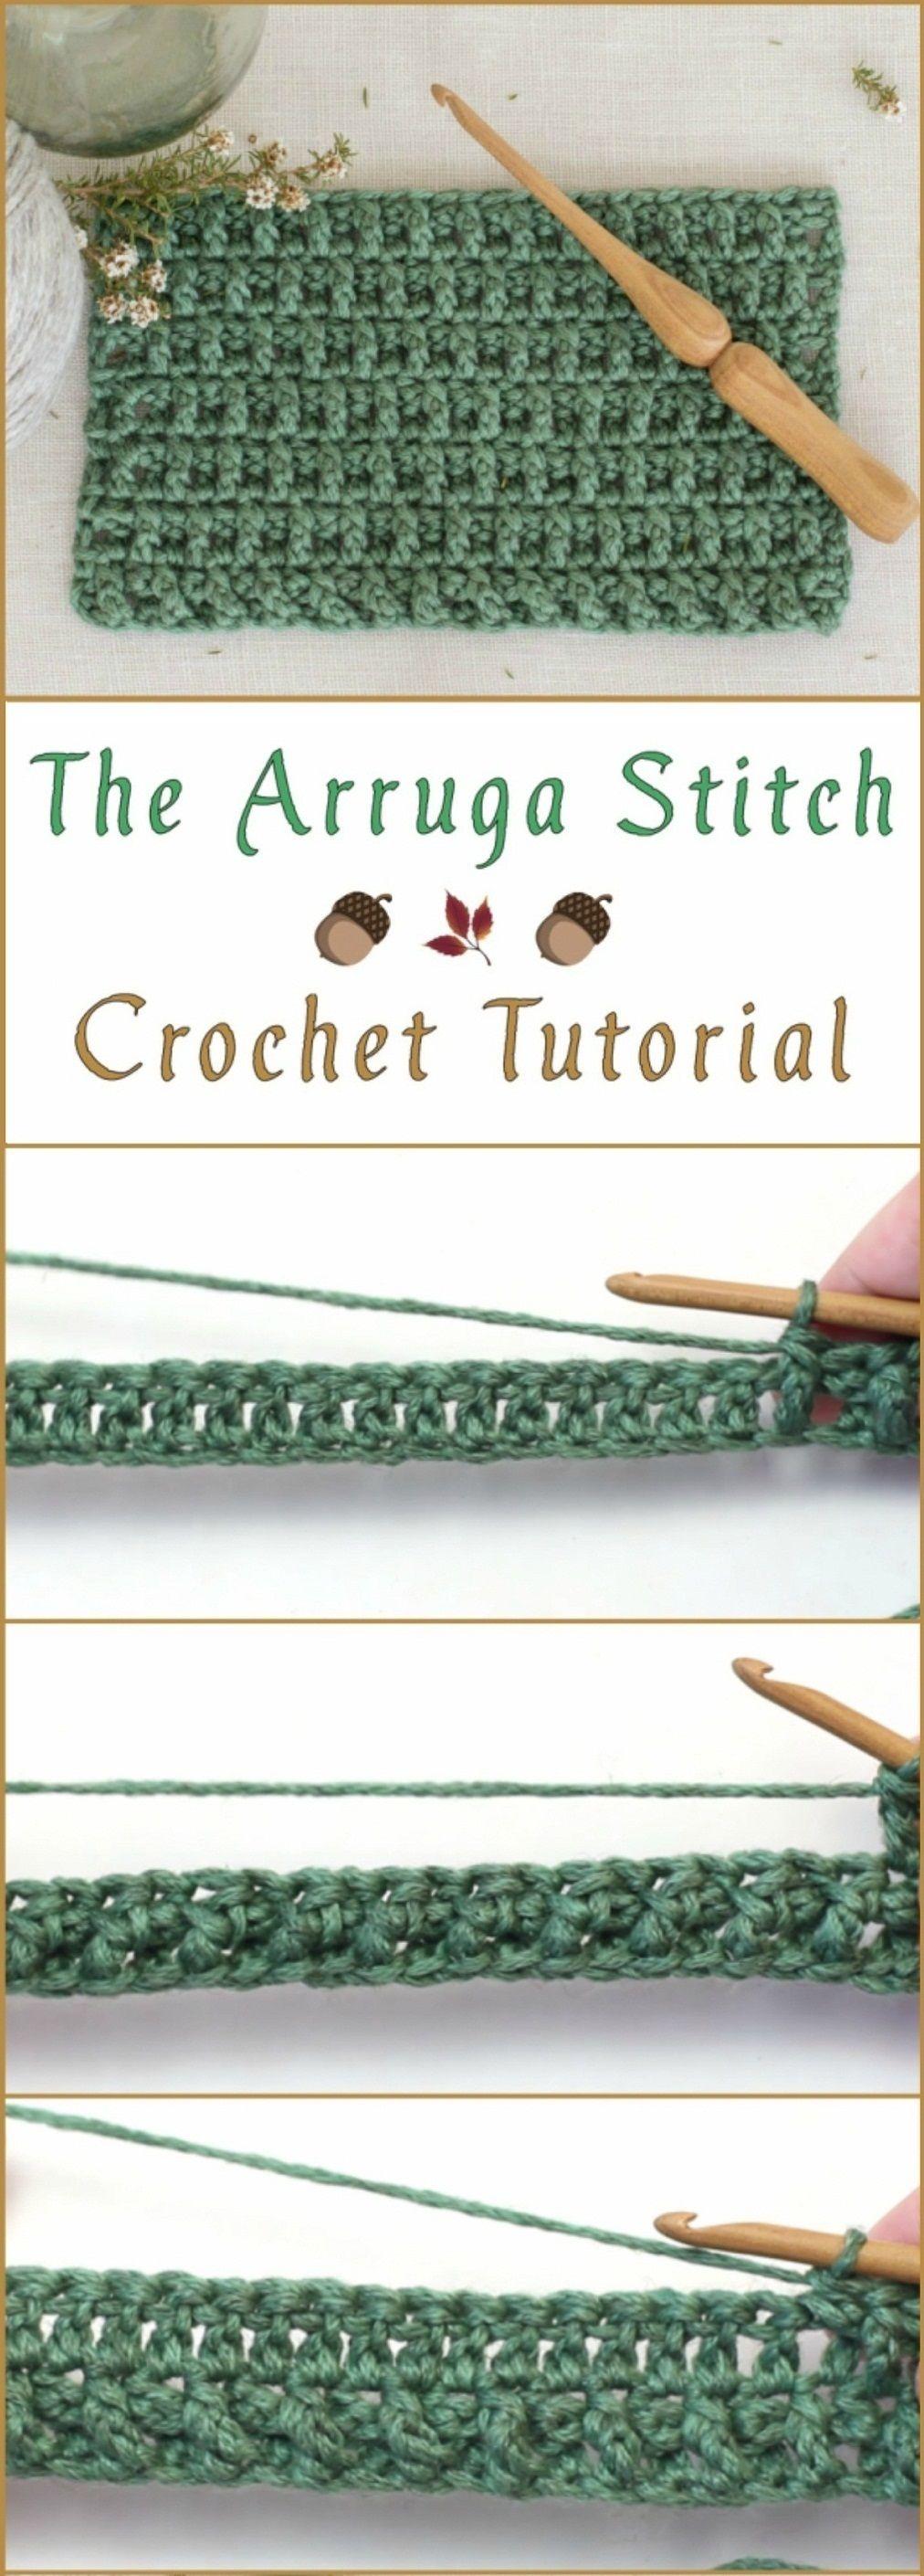 The Arruga Stitch Crochet Tutorial | Crochet love | Pinterest ...